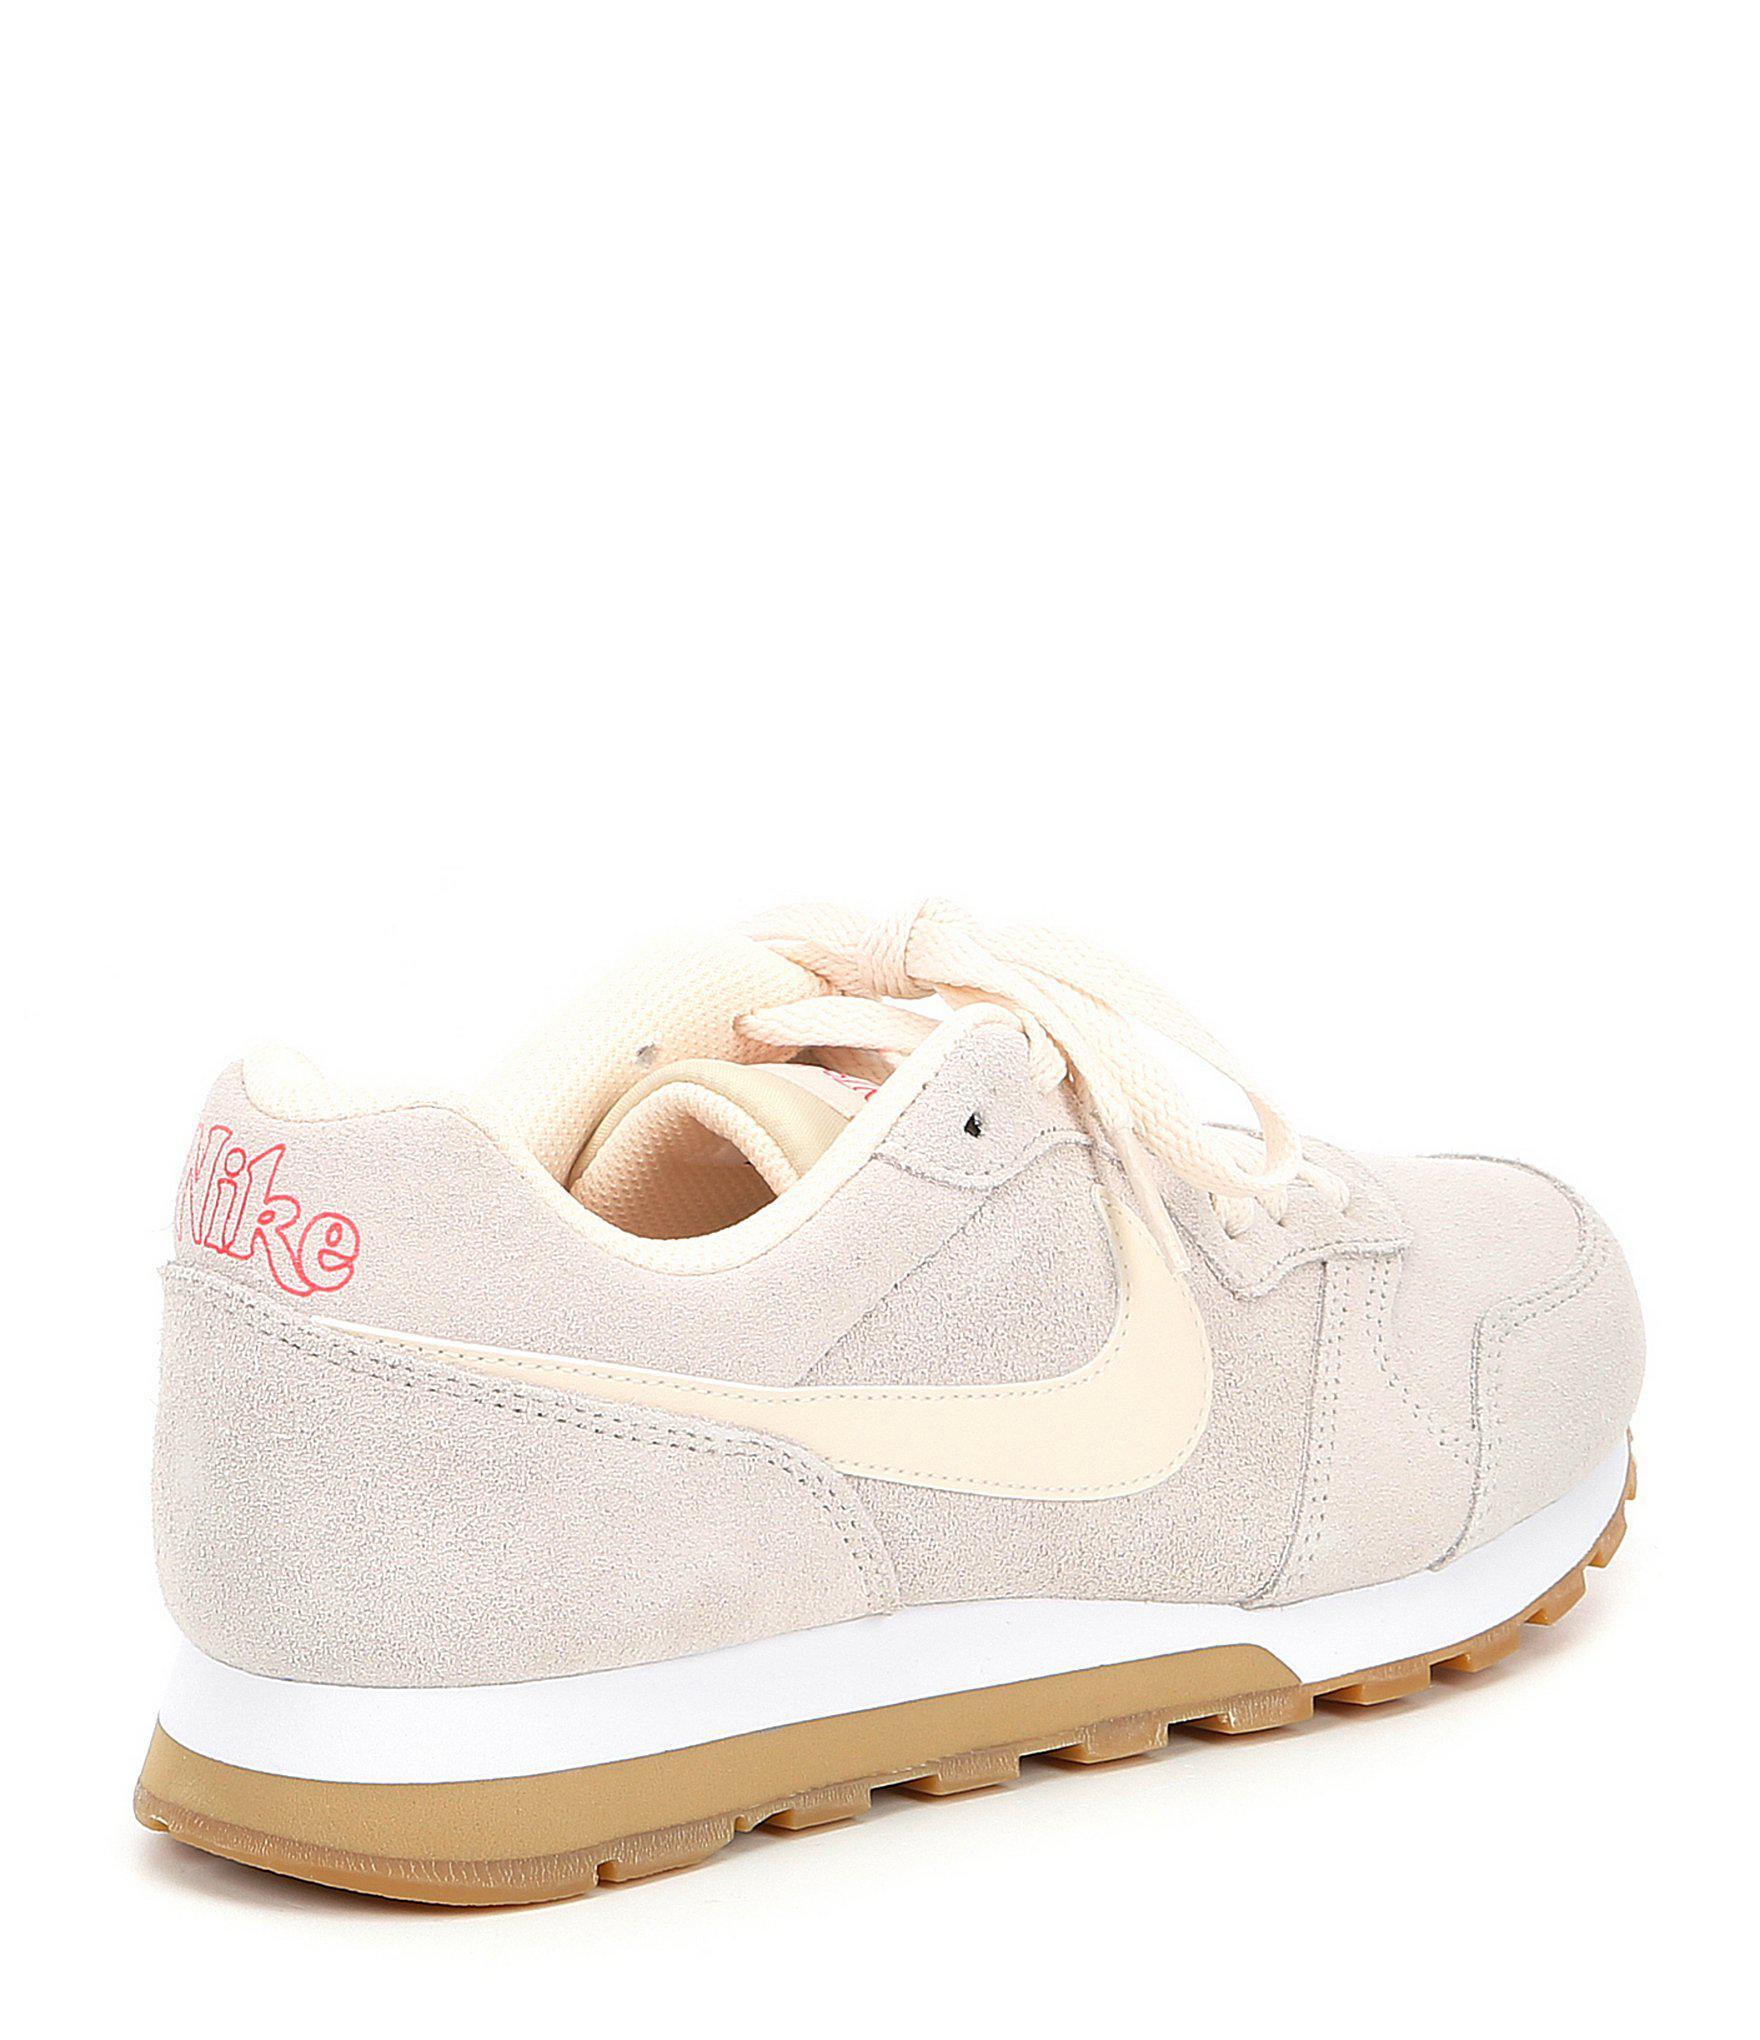 f5e72a1f1a8 Lyst - Nike Women s Md Runner 2 Se Retro Running Shoe in White